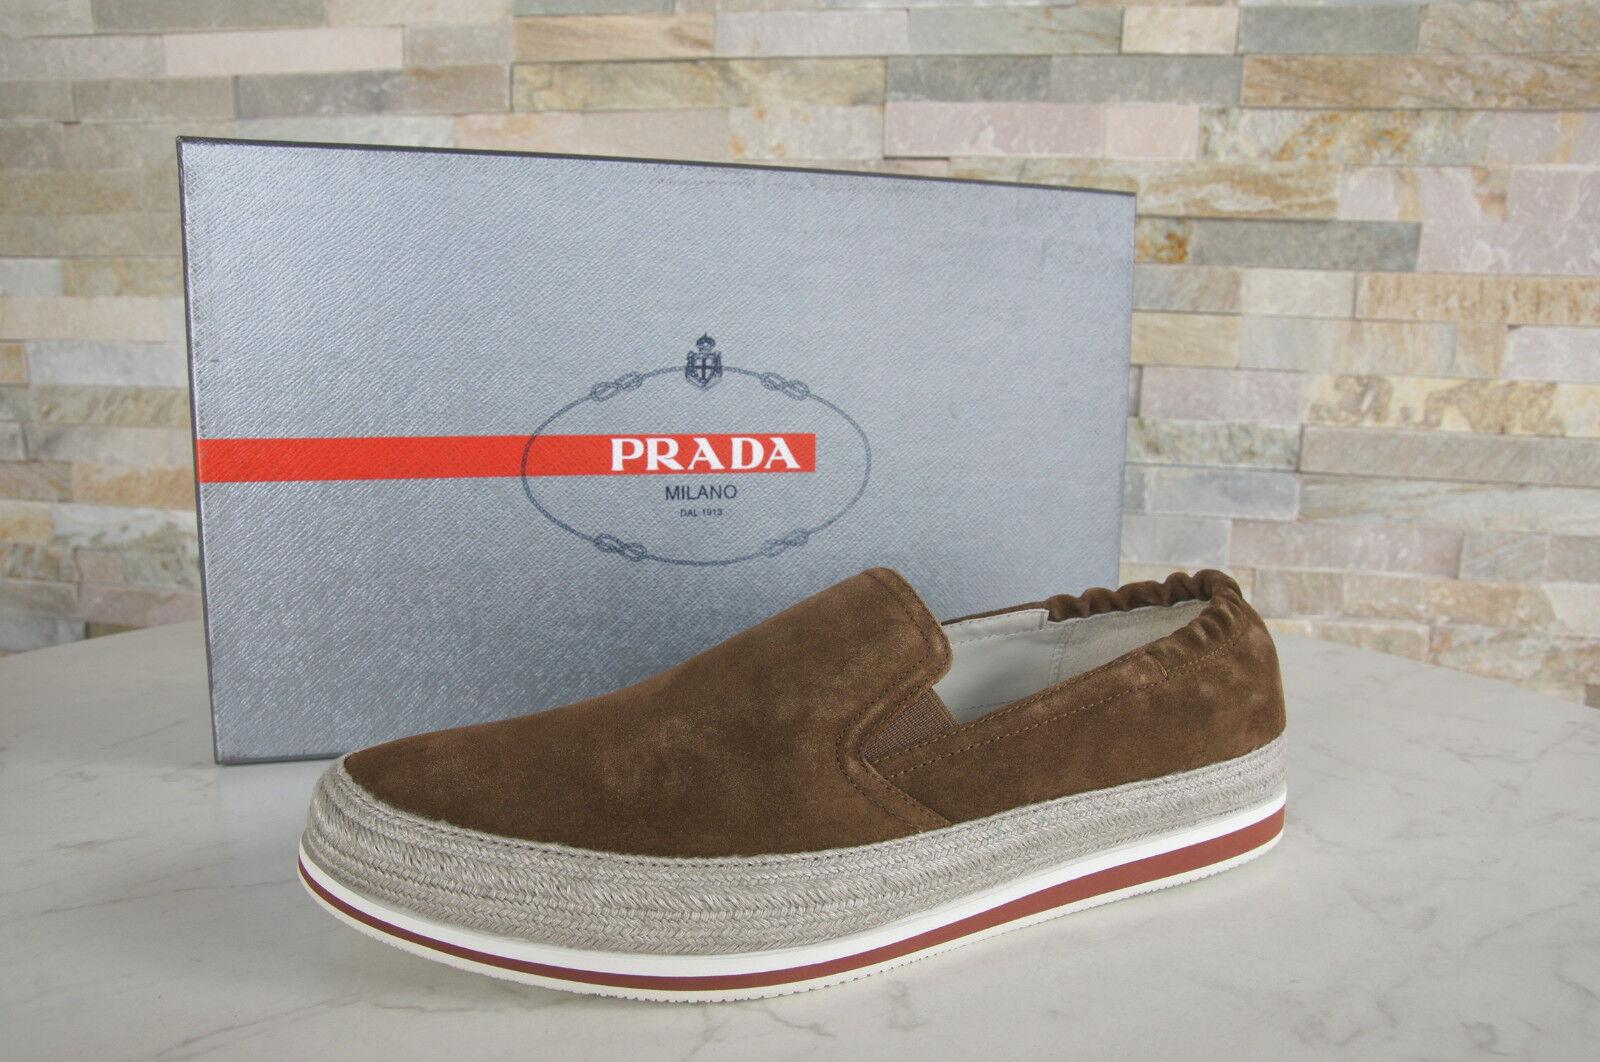 PRADA Gr 41,5  7,5 Slipper Slip-On Halbschuhe Schuhe 4D2363 zigarre NEU UVP 420